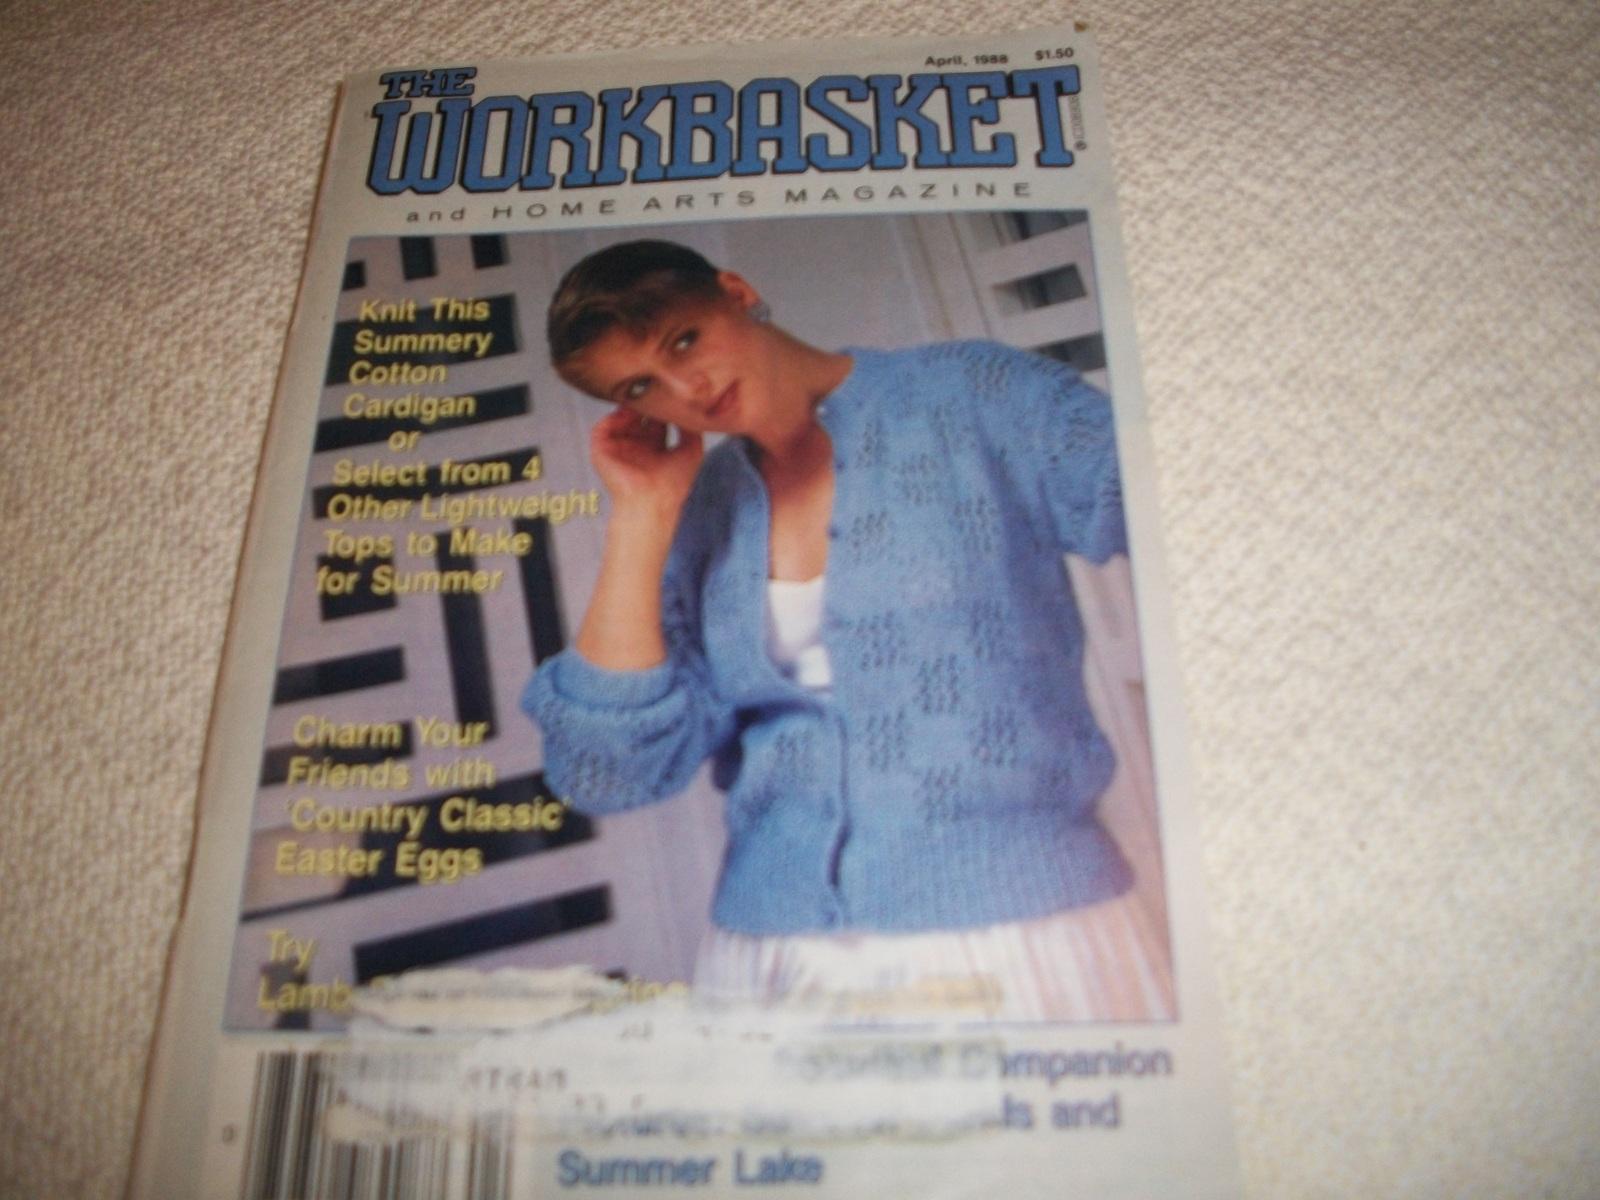 Workbasket Magazine April 1988 - $5.00